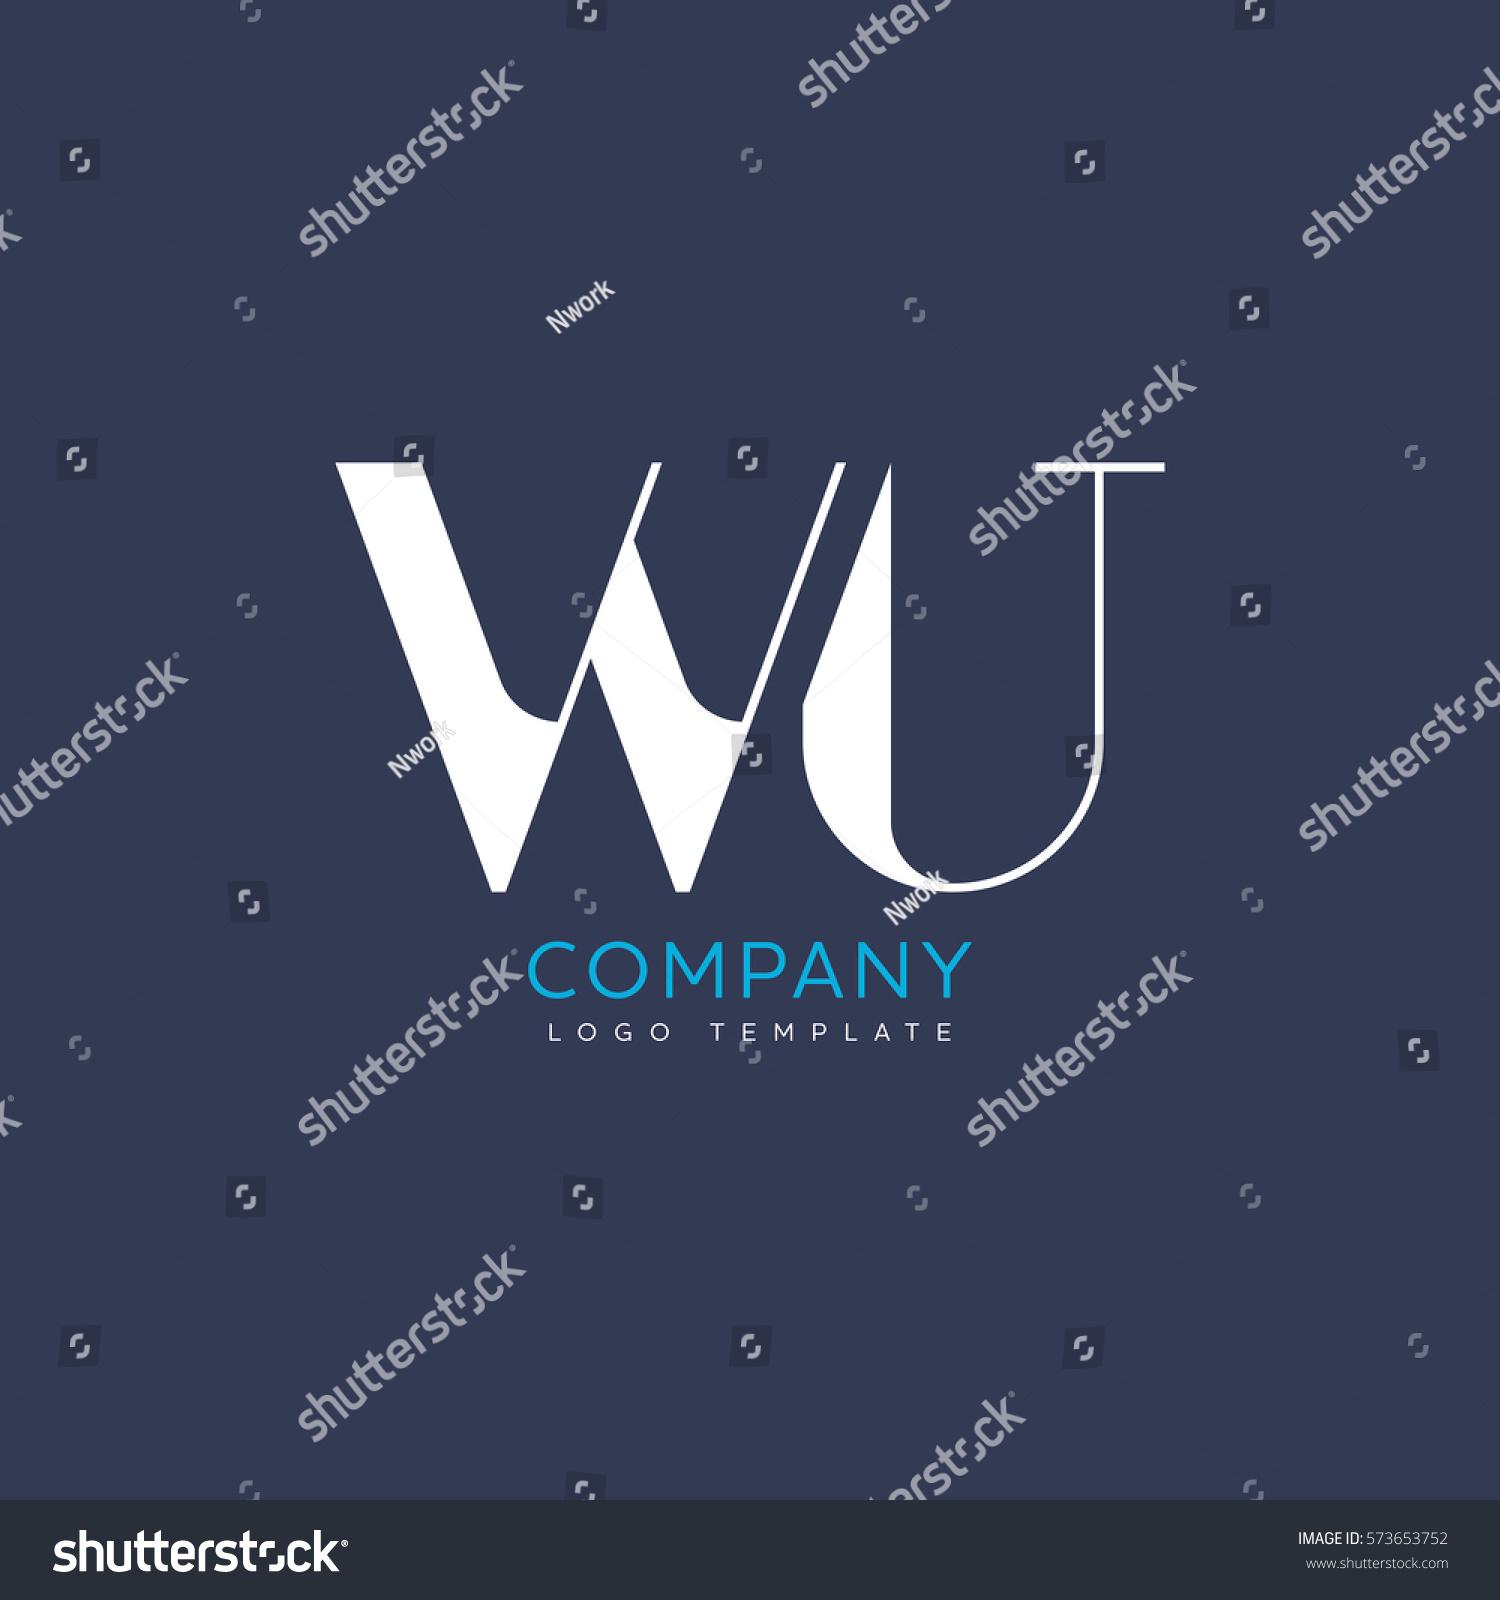 W U Letter Logo Design Stock Vector (Royalty Free) 573653752